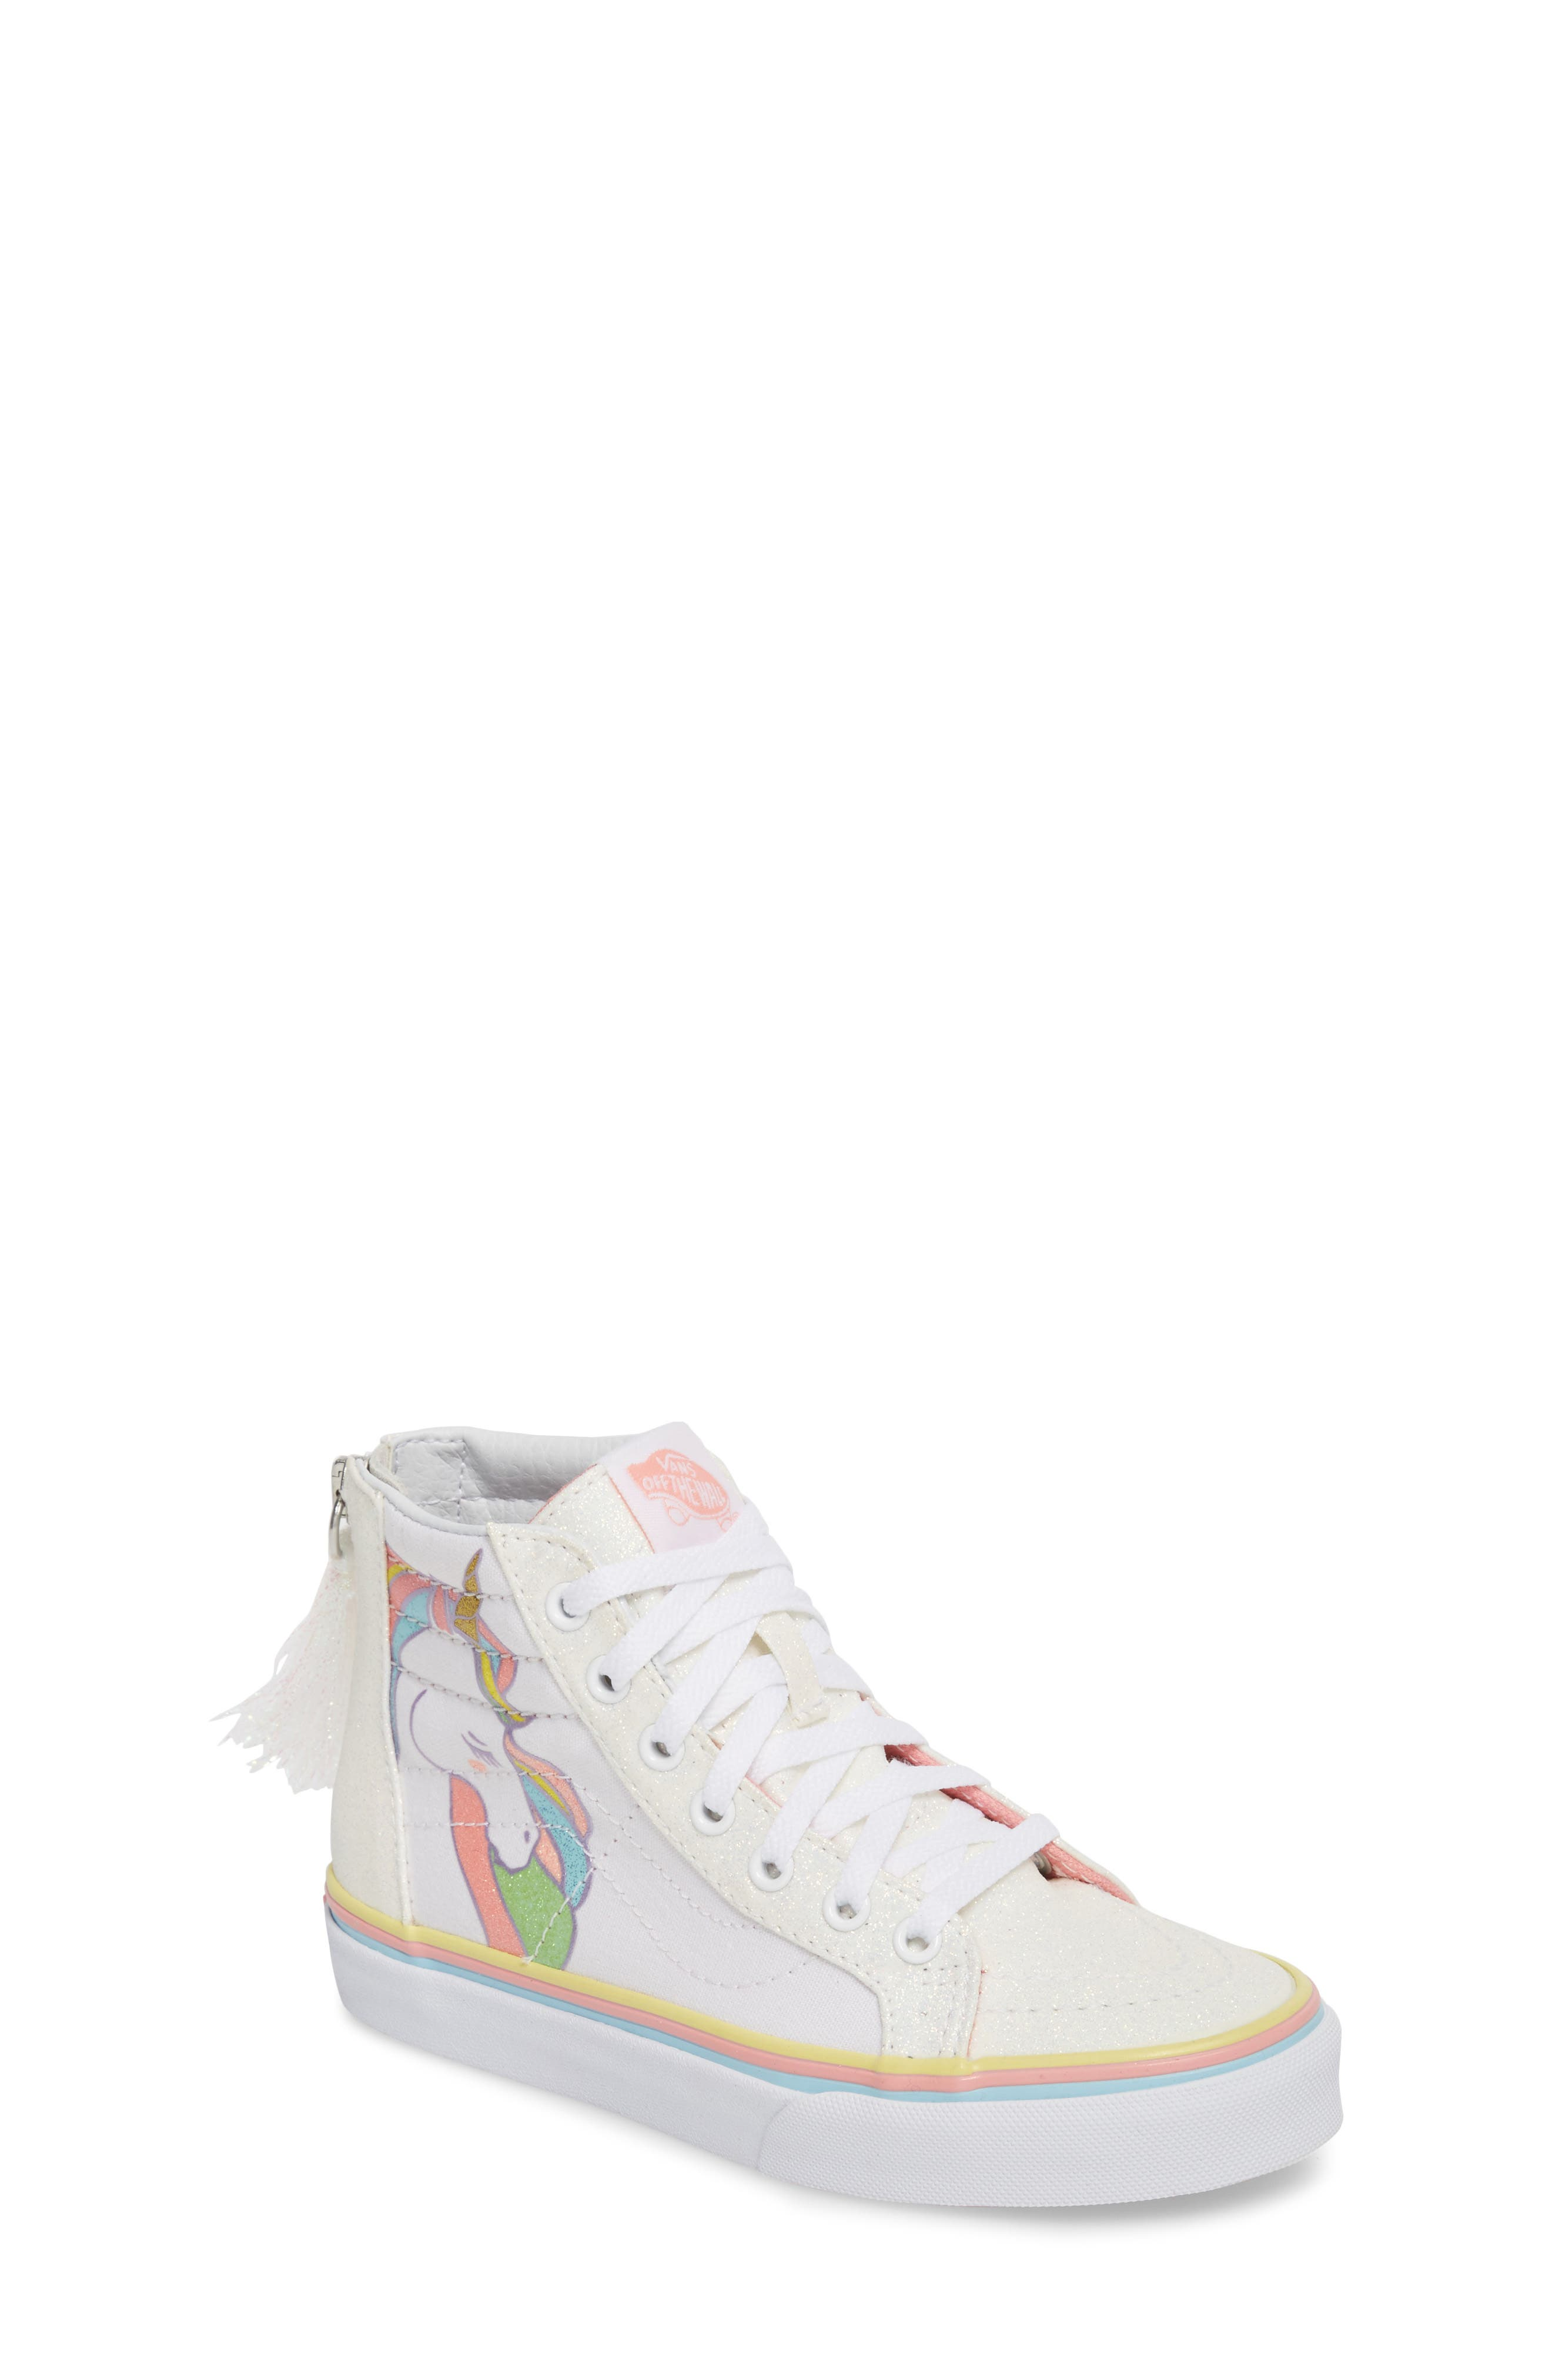 Sk8-Hi Zip Unicorn Glitter High Top Sneaker,                             Main thumbnail 1, color,                             White Glitter Unicorn